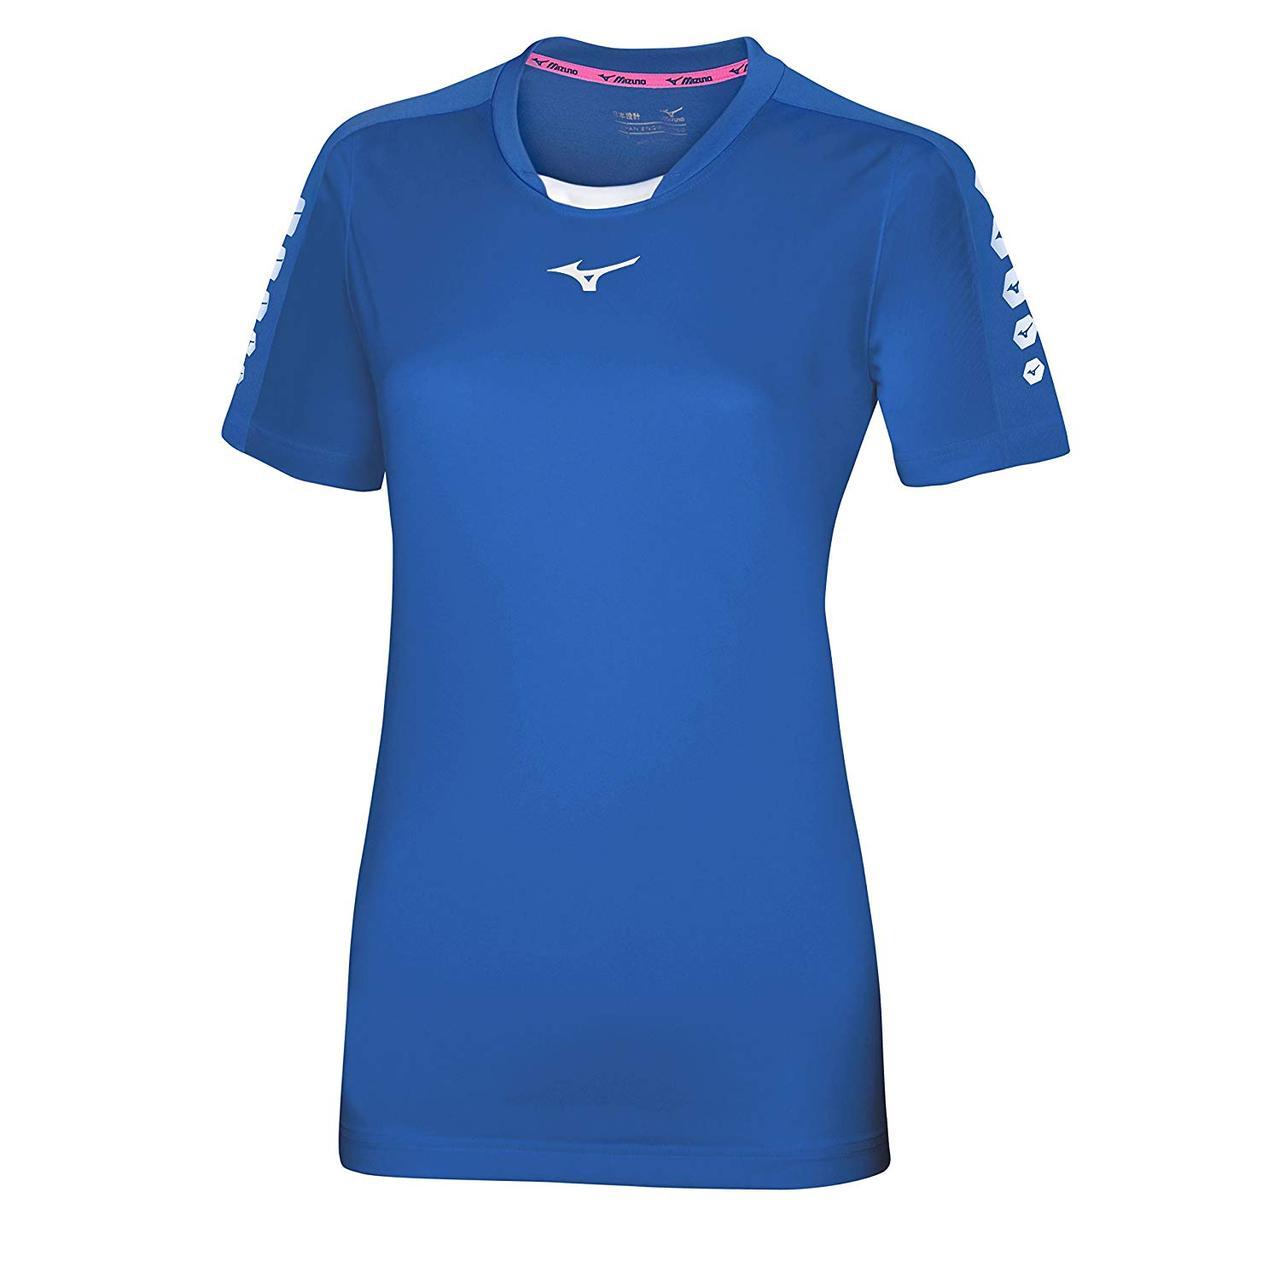 Футболка Mizuno Soukyu Shirt (W) X2EA7700-22